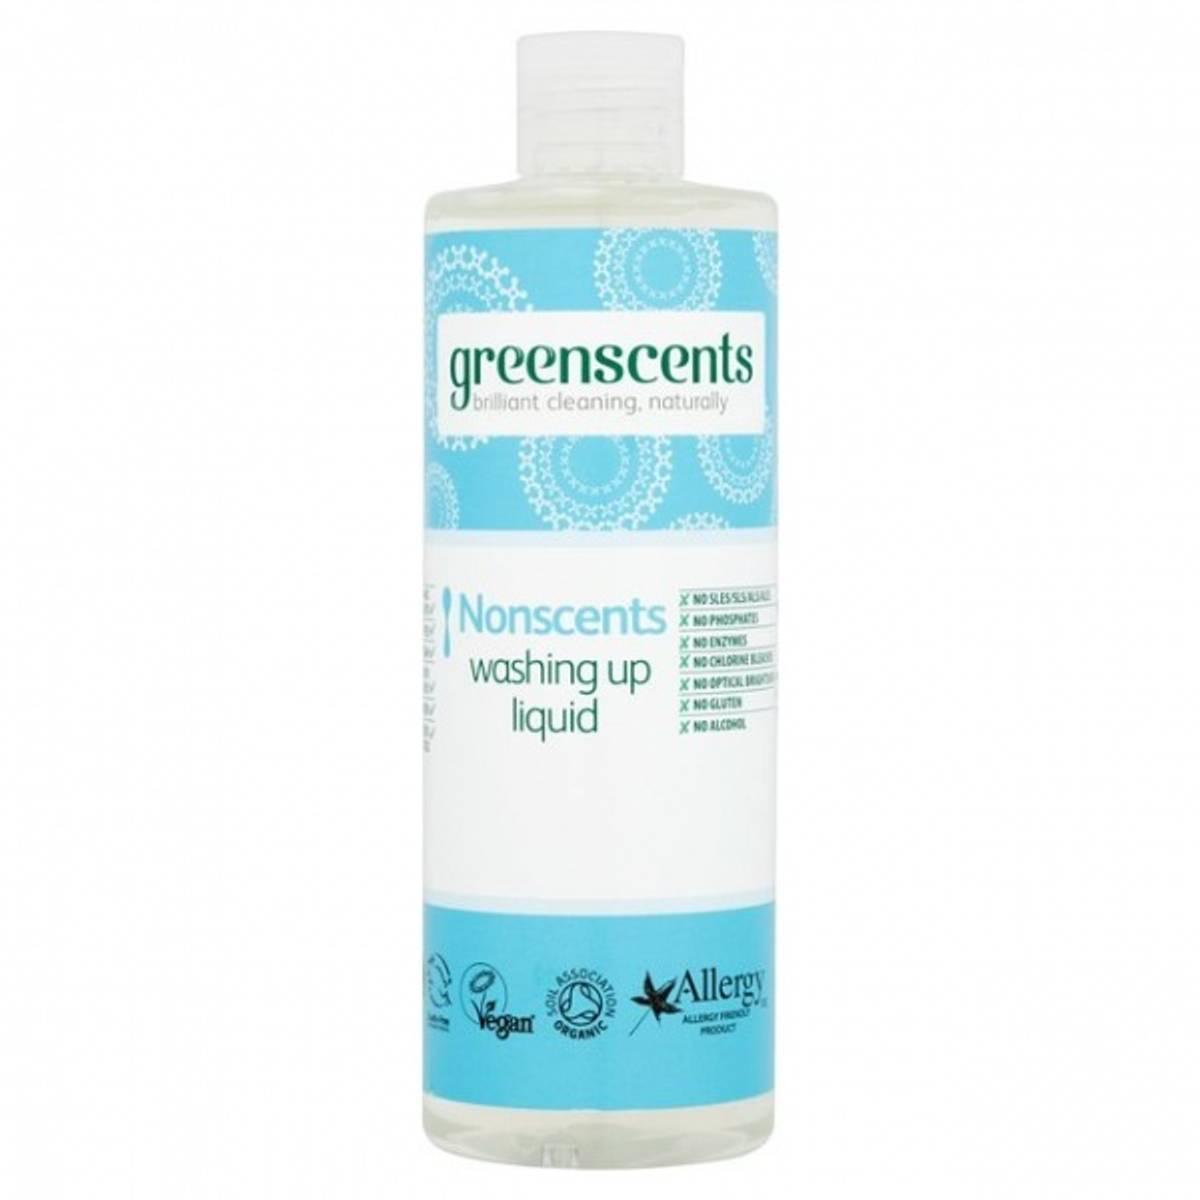 Oppvasksåpe DUFTFRI 400 ml / Greenscents